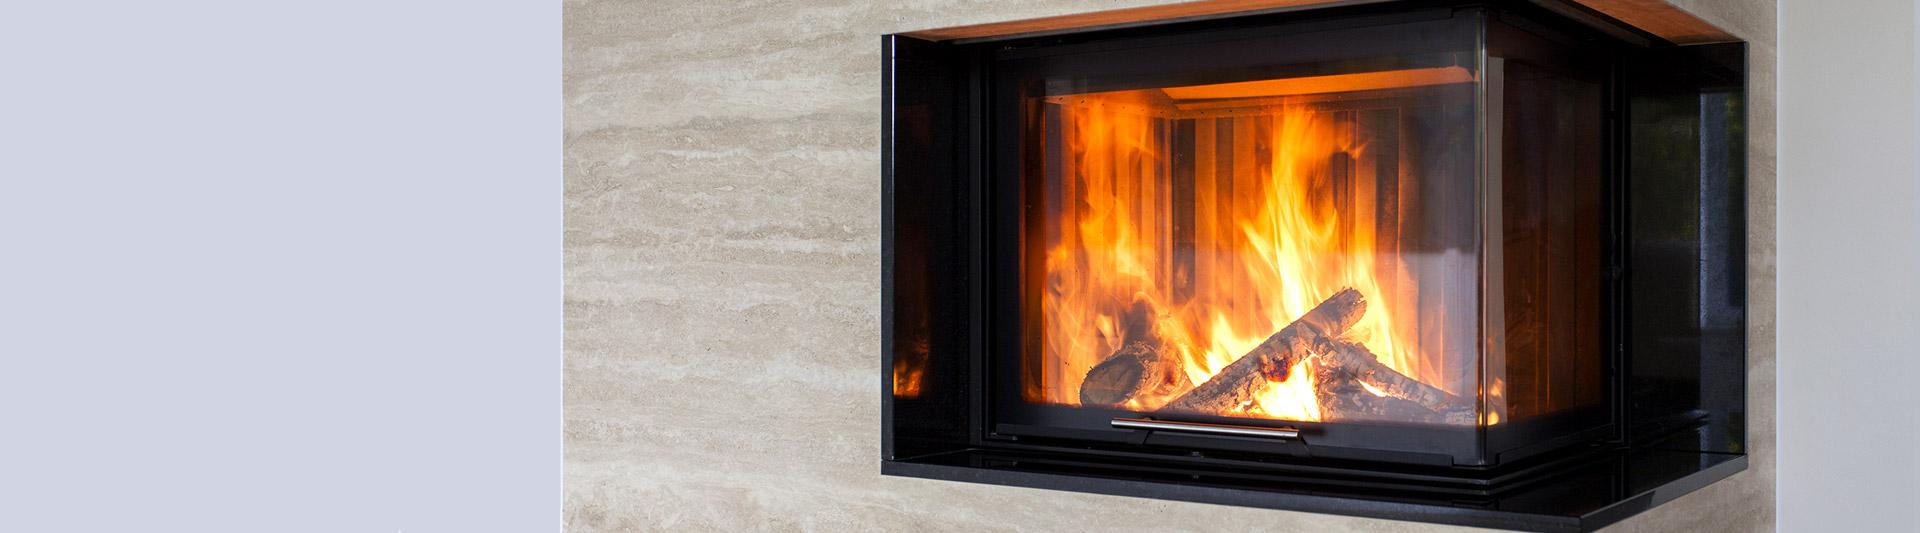 Fireplace glass doors at Benson Stone